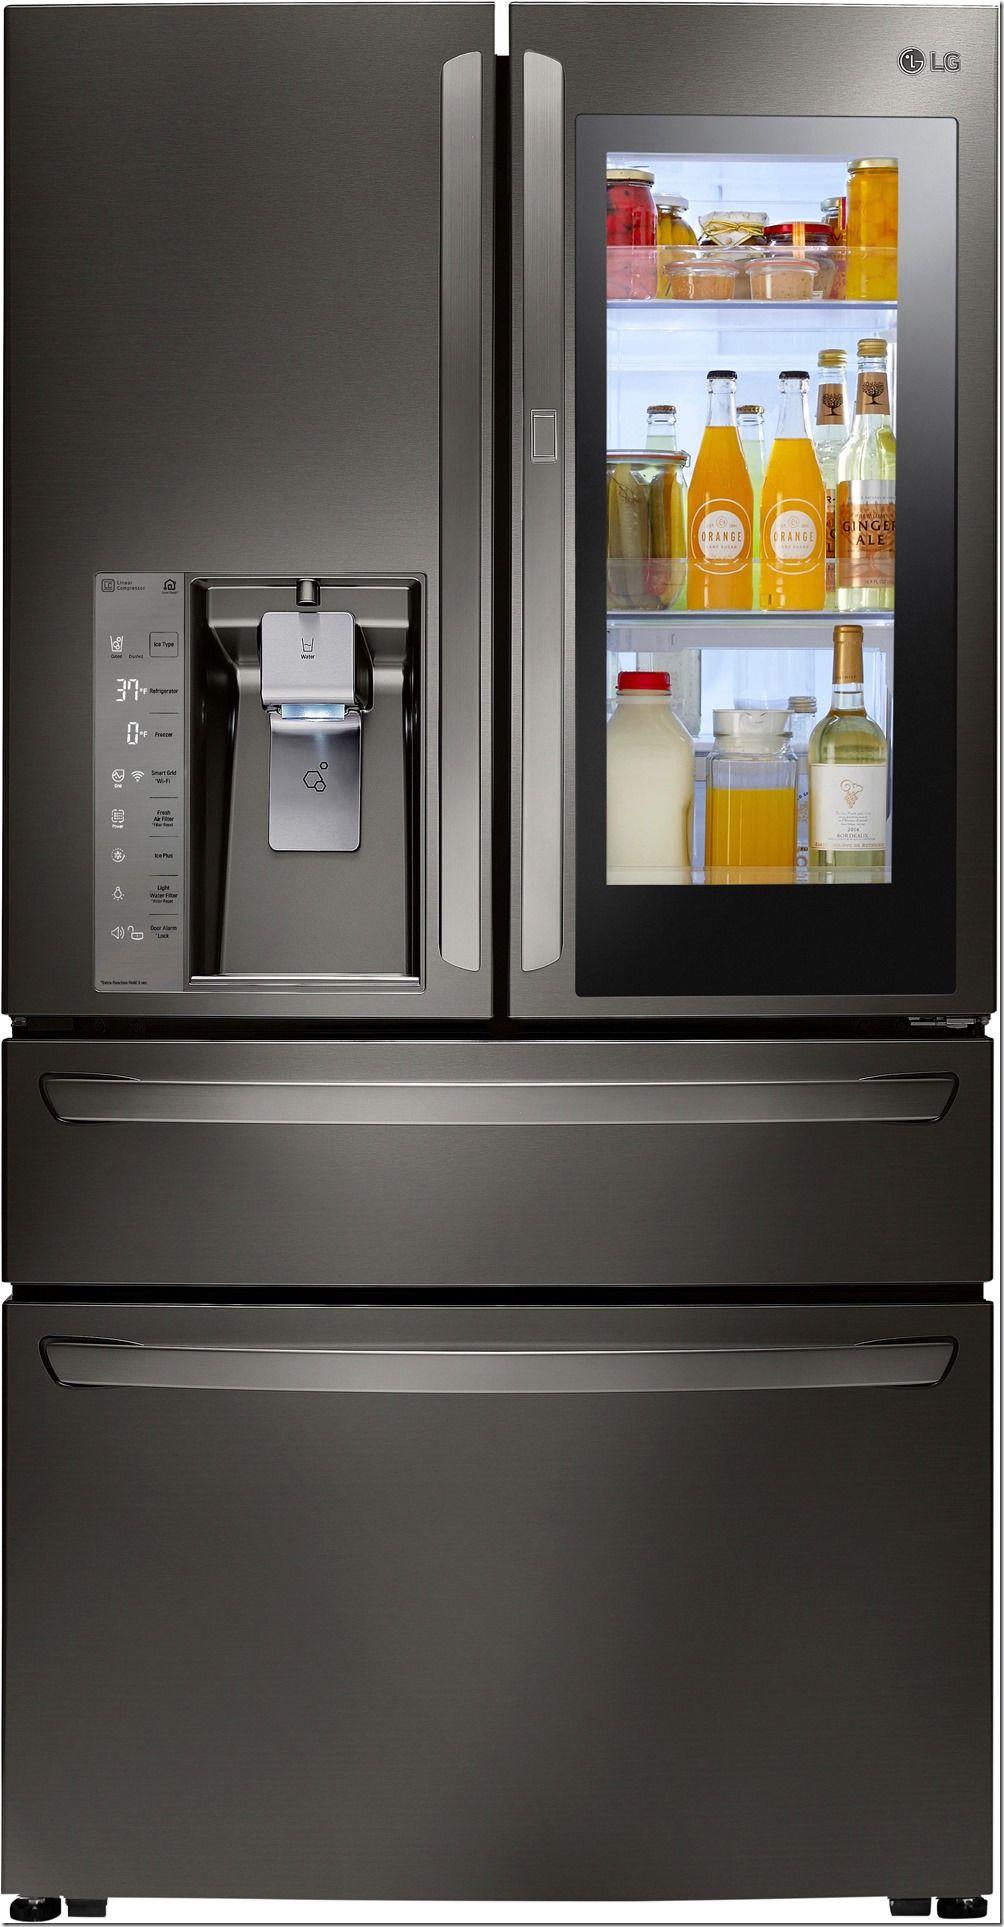 Lg Smart Fridge Smart Fridge Kitchen Appliances Glass Door Refrigerator